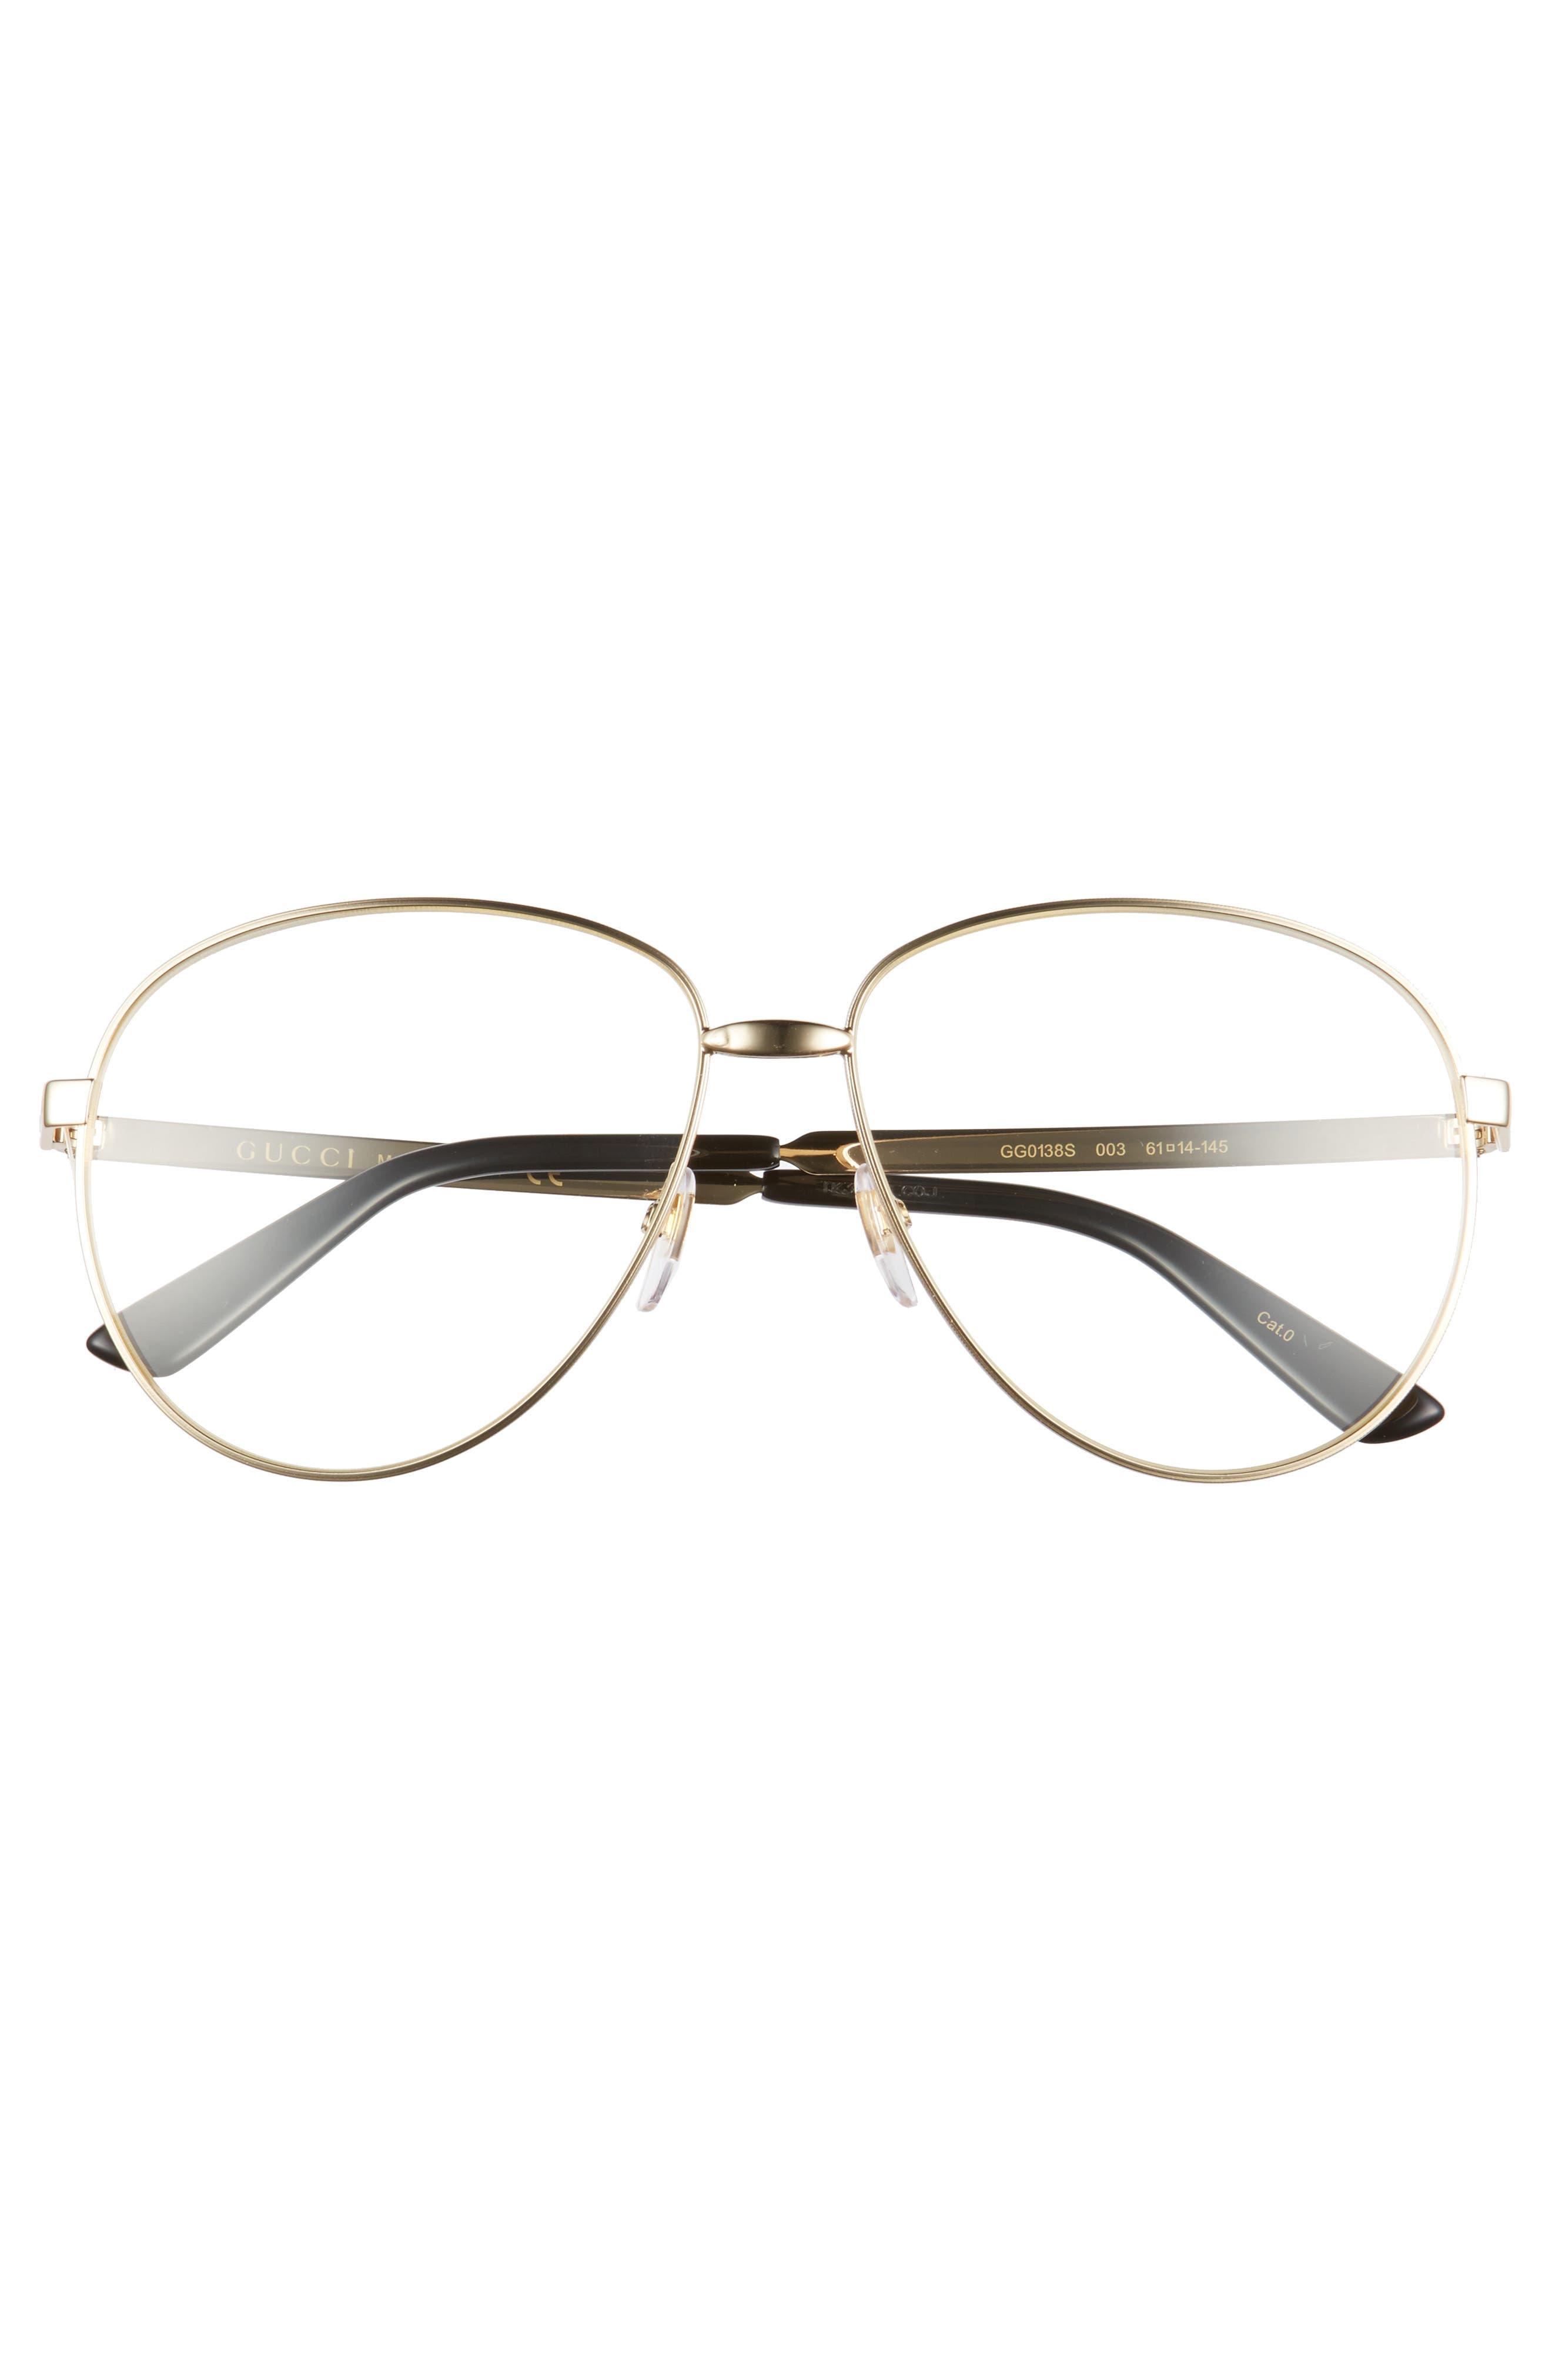 61mm Aviator Sunglasses,                             Alternate thumbnail 2, color,                             YELLOW ENDURA GOLD